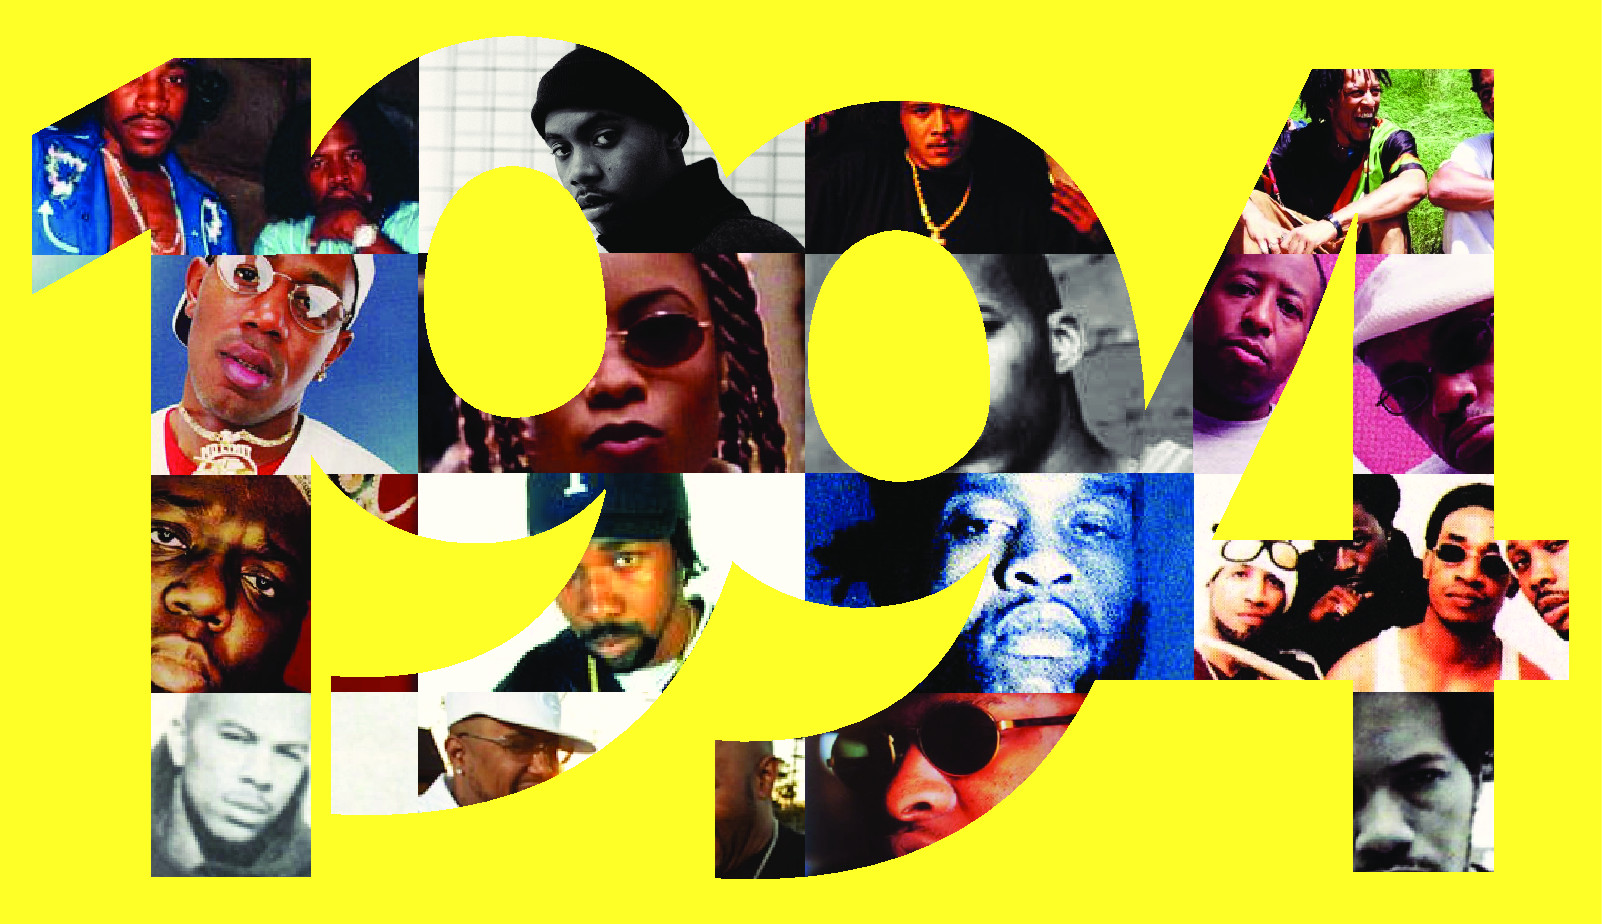 U00bb The 1994 Rap Album Matrix  Is This Hip